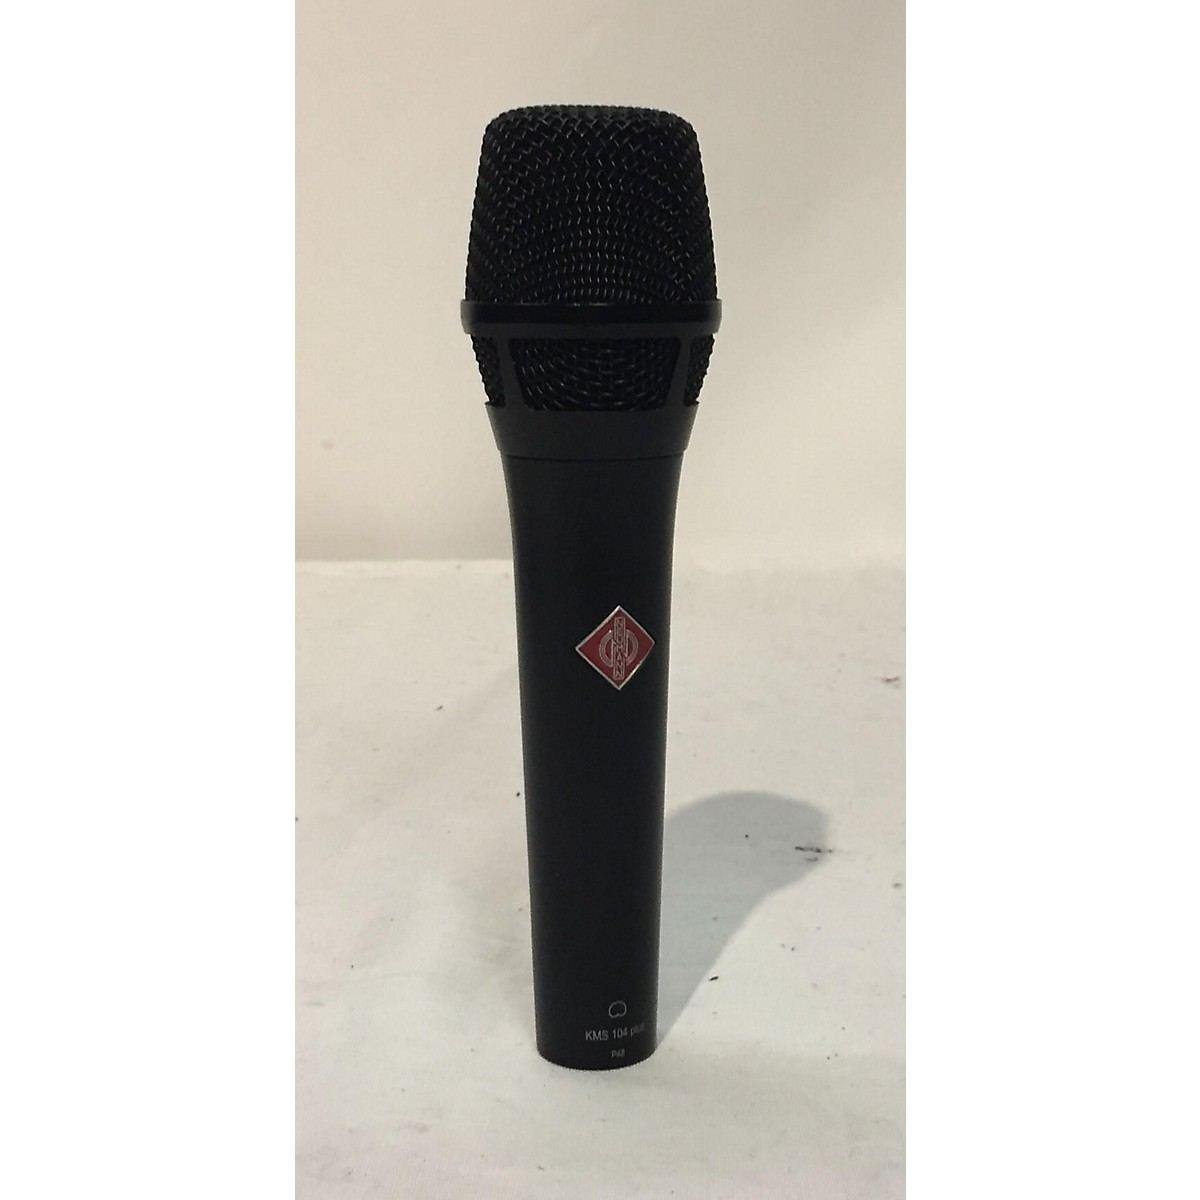 Neumann KMS104 Plus Condenser Microphone